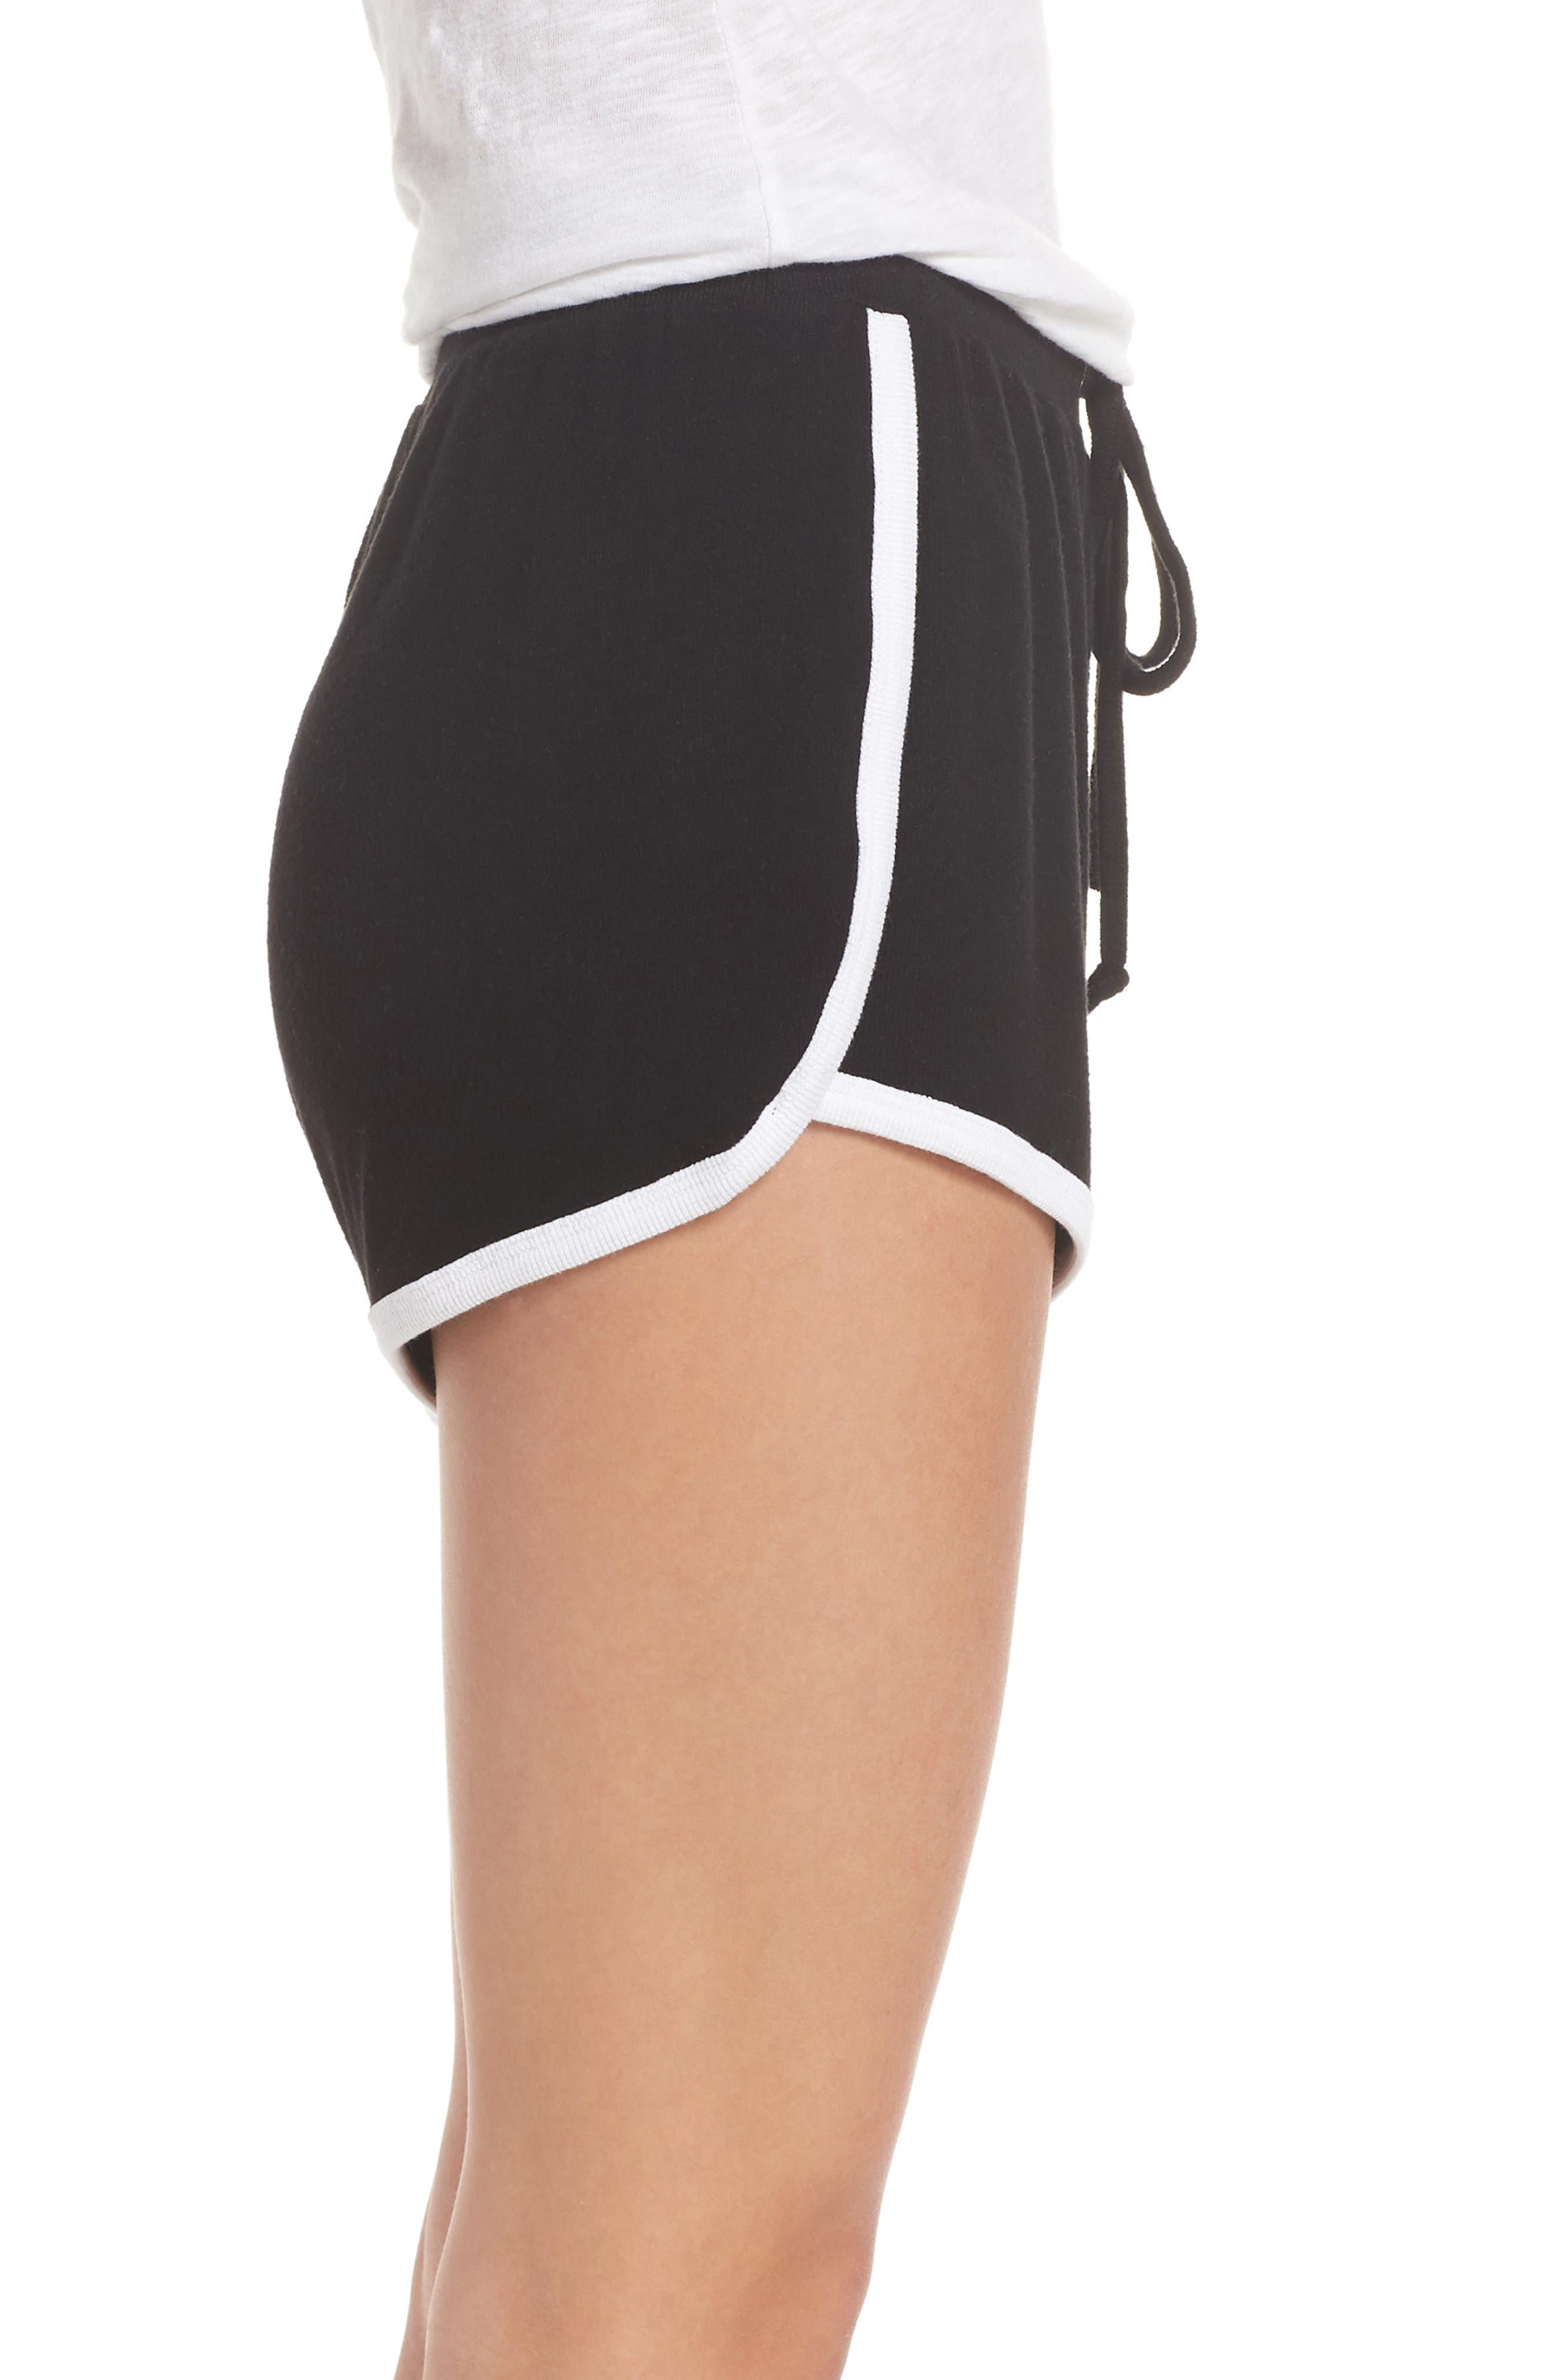 Too Cool Shorts,                             Alternate thumbnail 3, color,                             BLACK